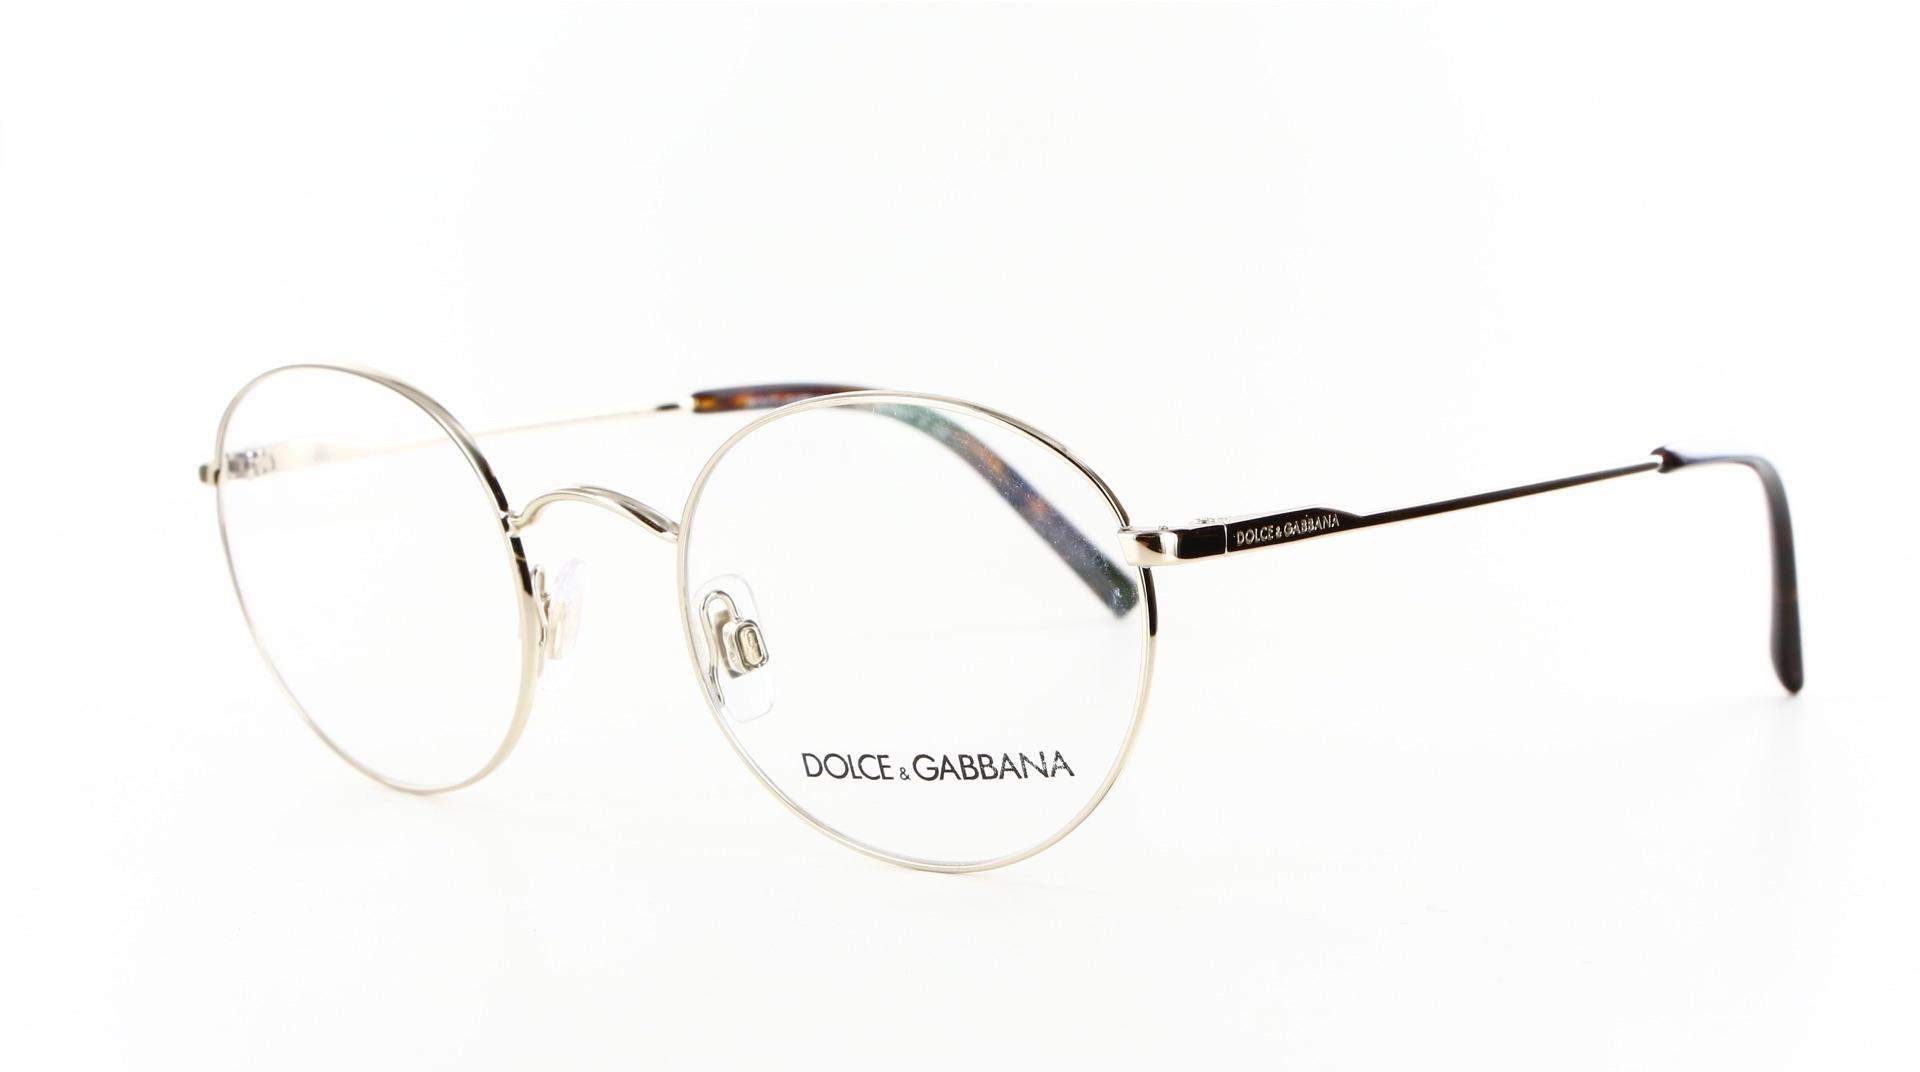 Dolce & Gabbana - ref: 77739